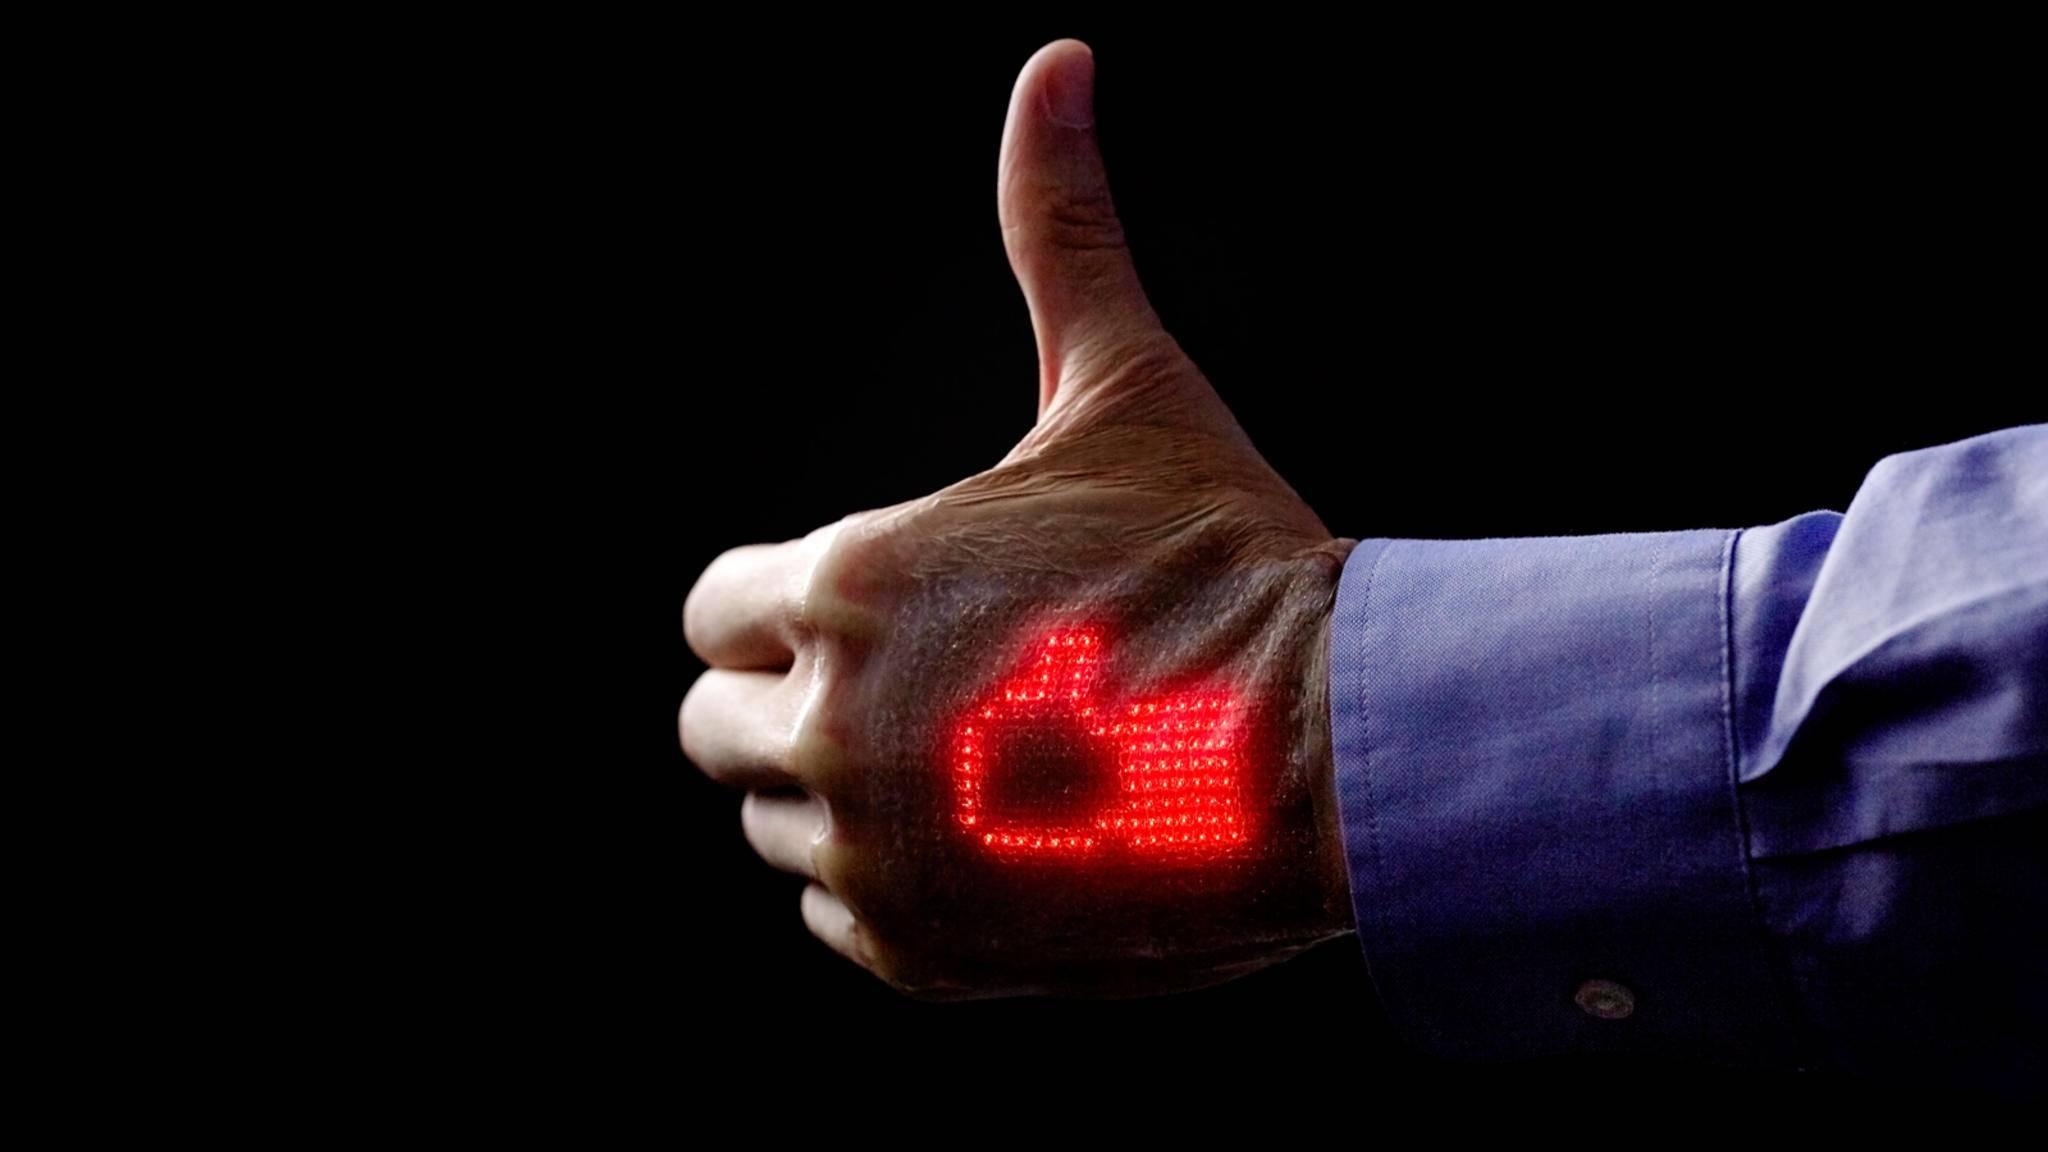 Skin Electronics: Neues E-Skin-Wearable macht Haut zum Display